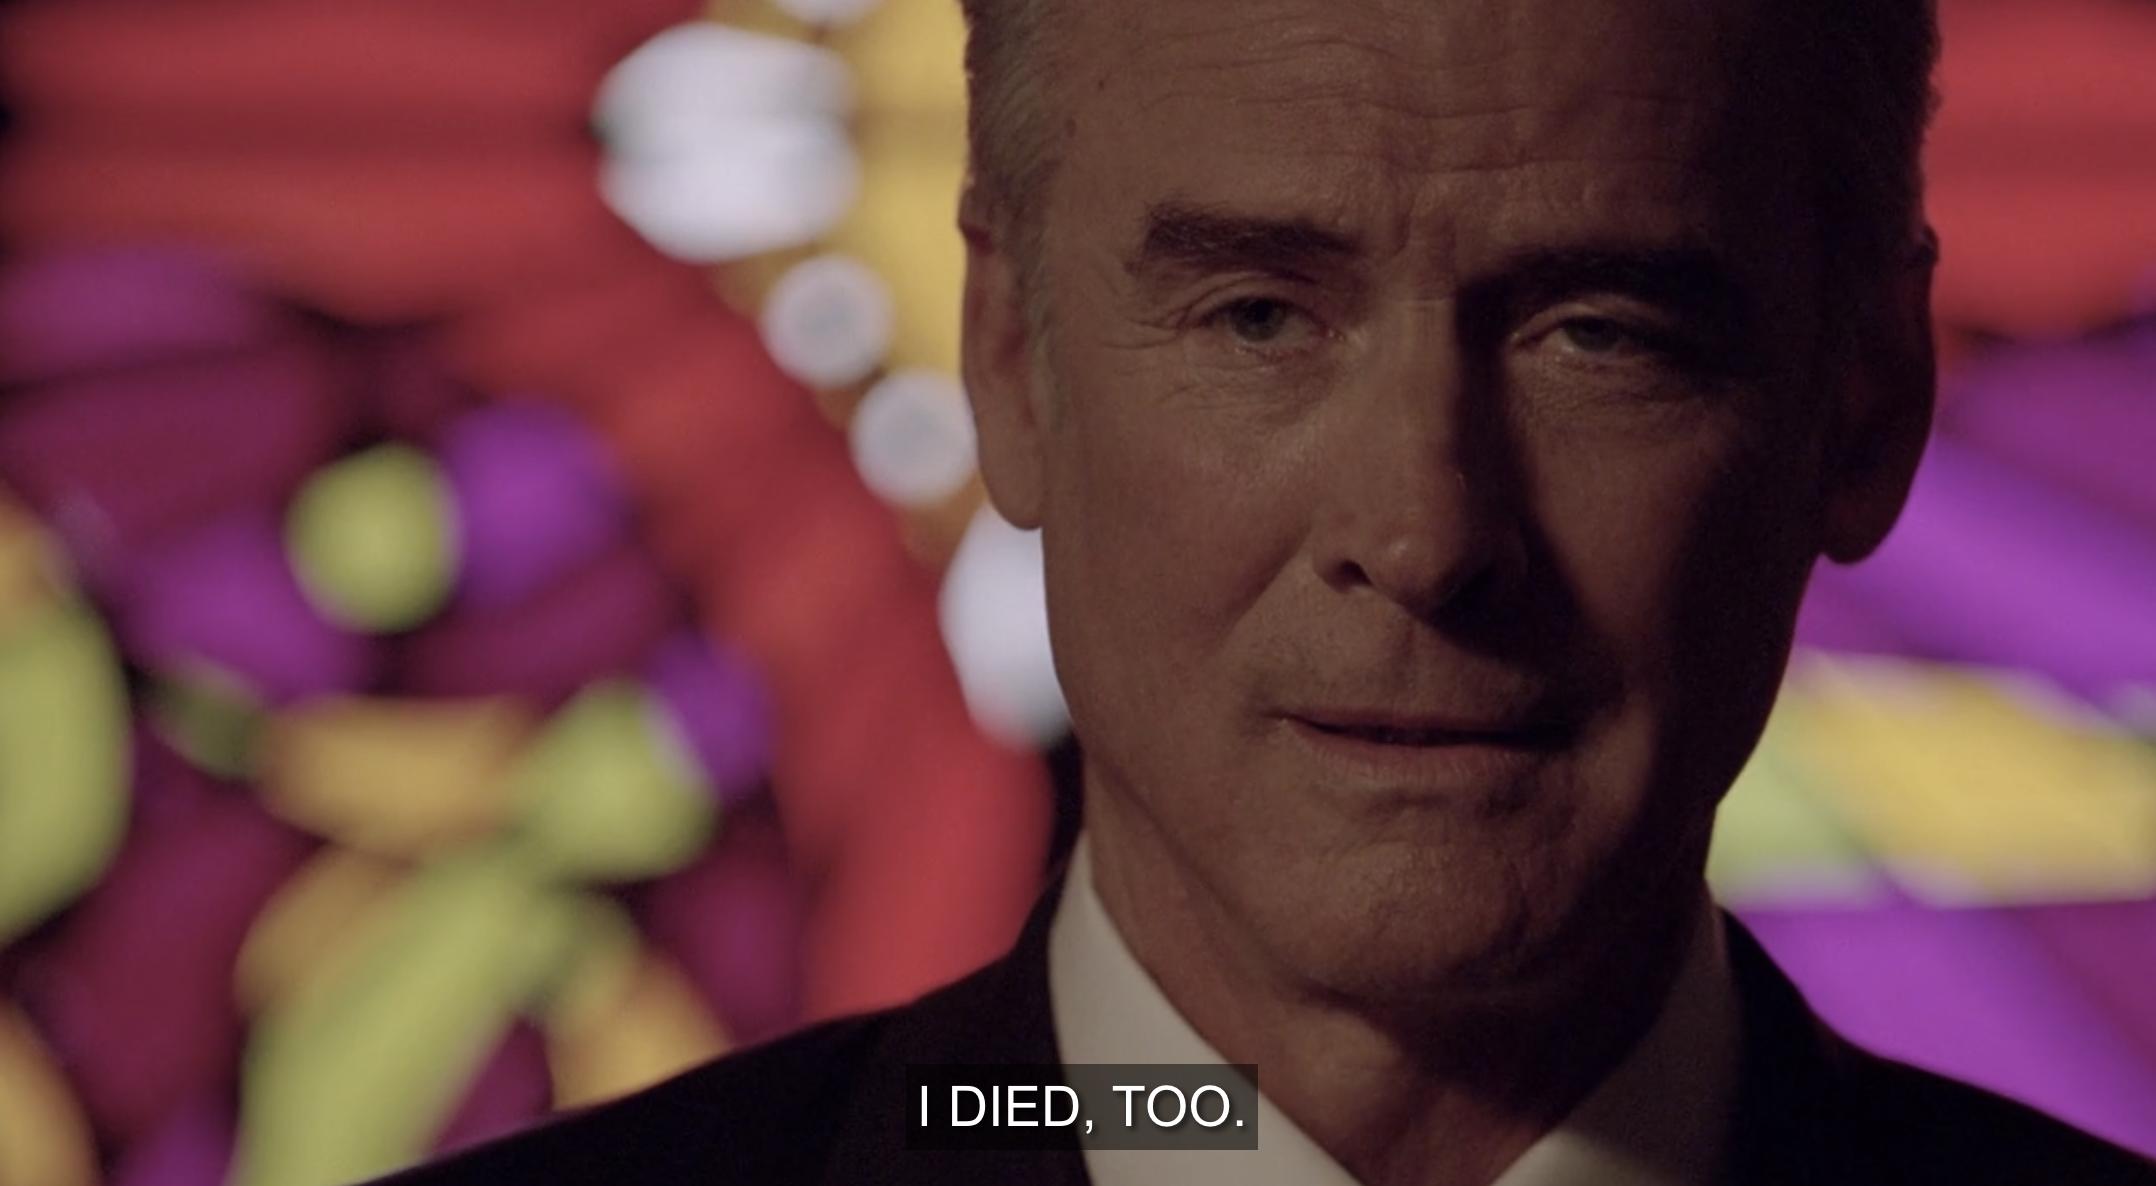 Jack's dad explaining he died